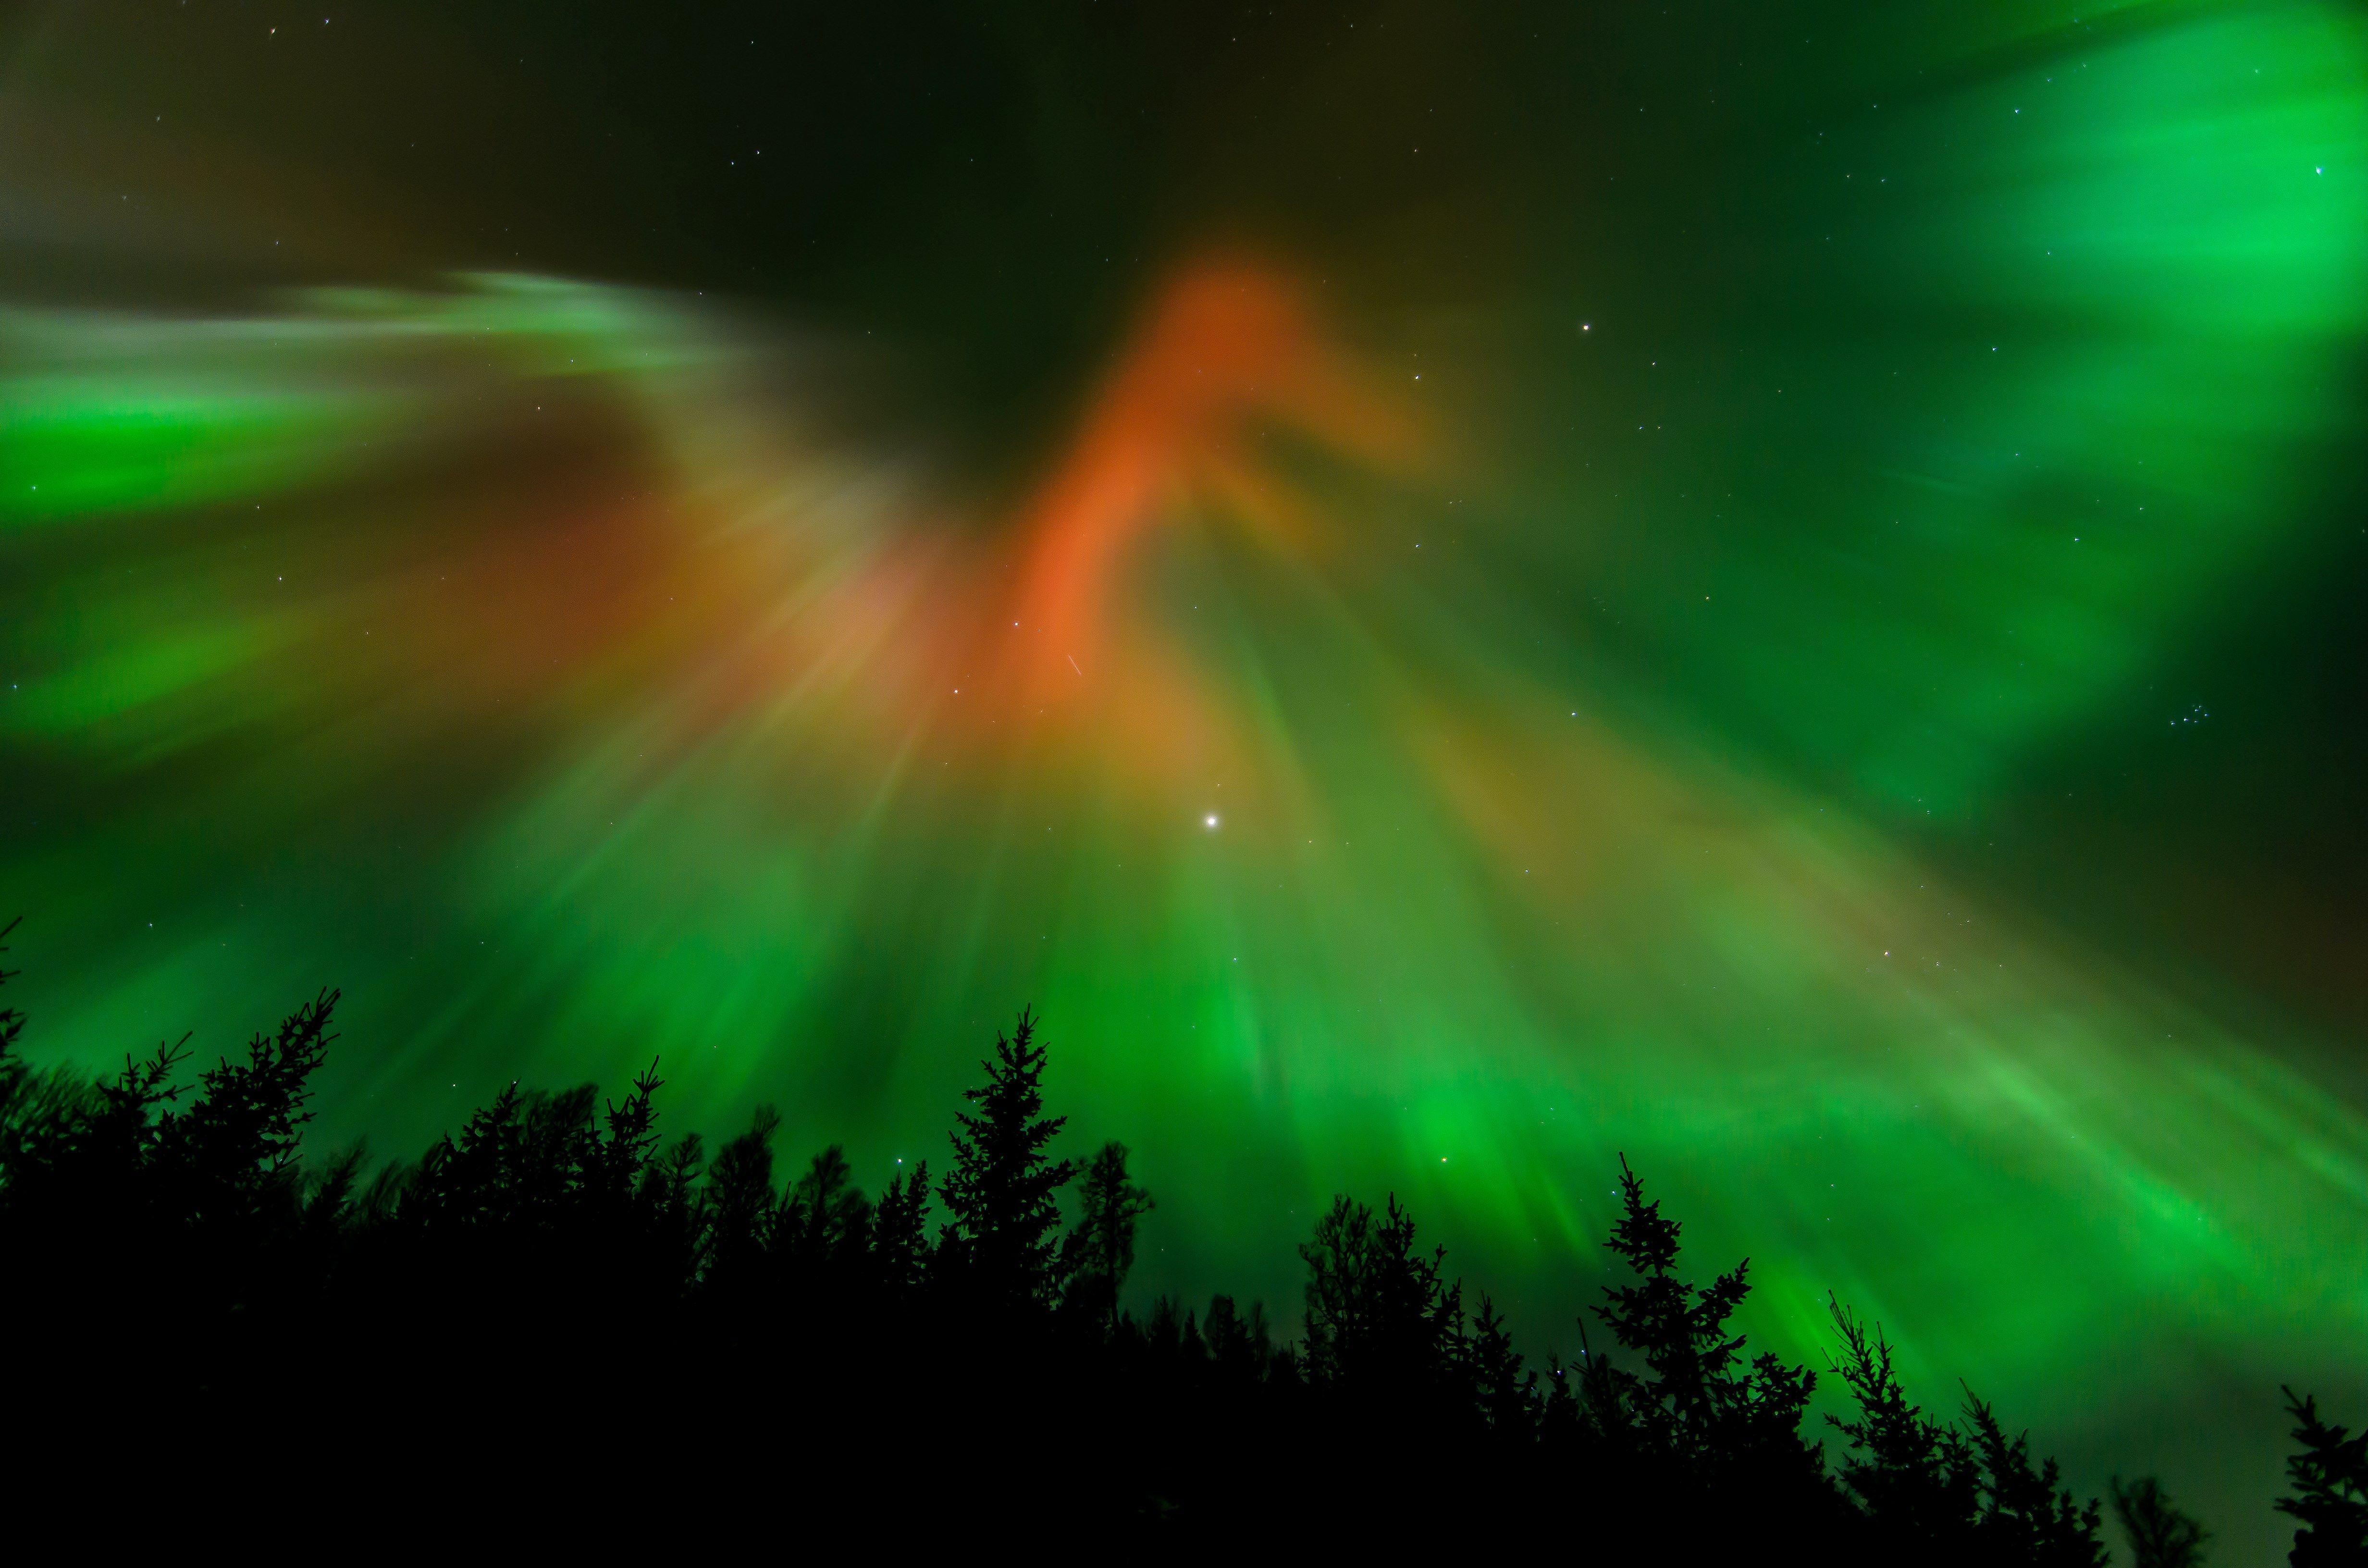 #4k wallpaper aurora borealis (4928x3264)